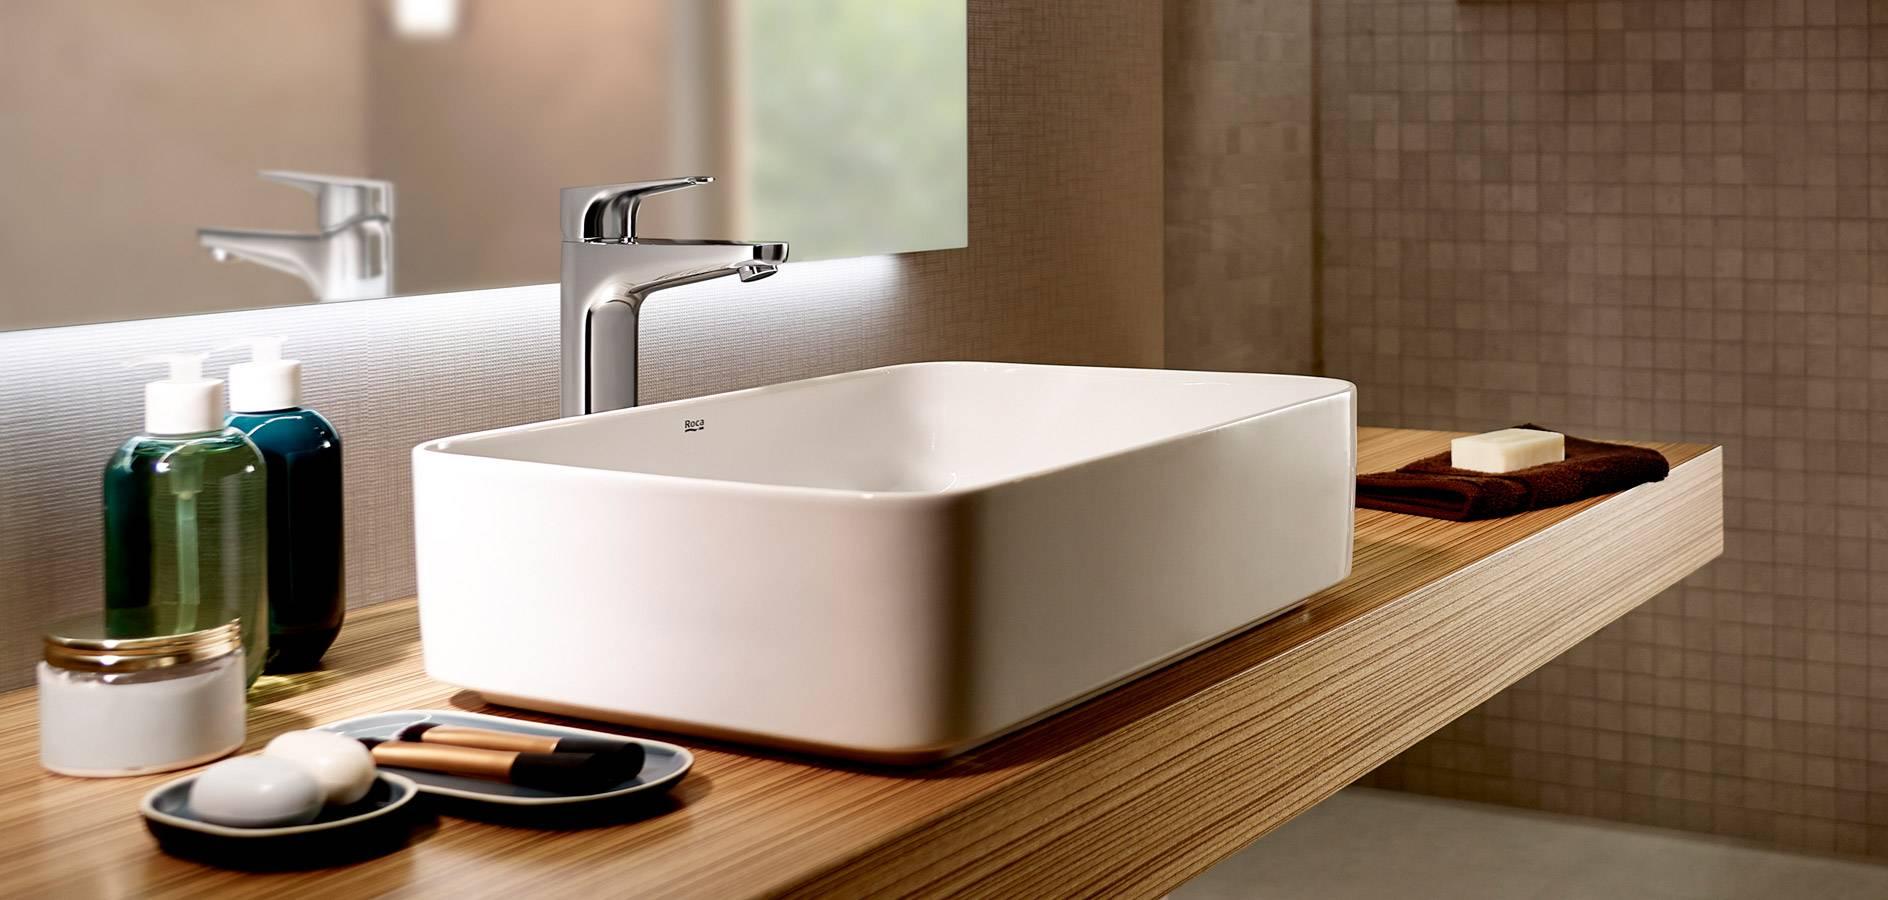 Designer Bathroom Taps Discover Some